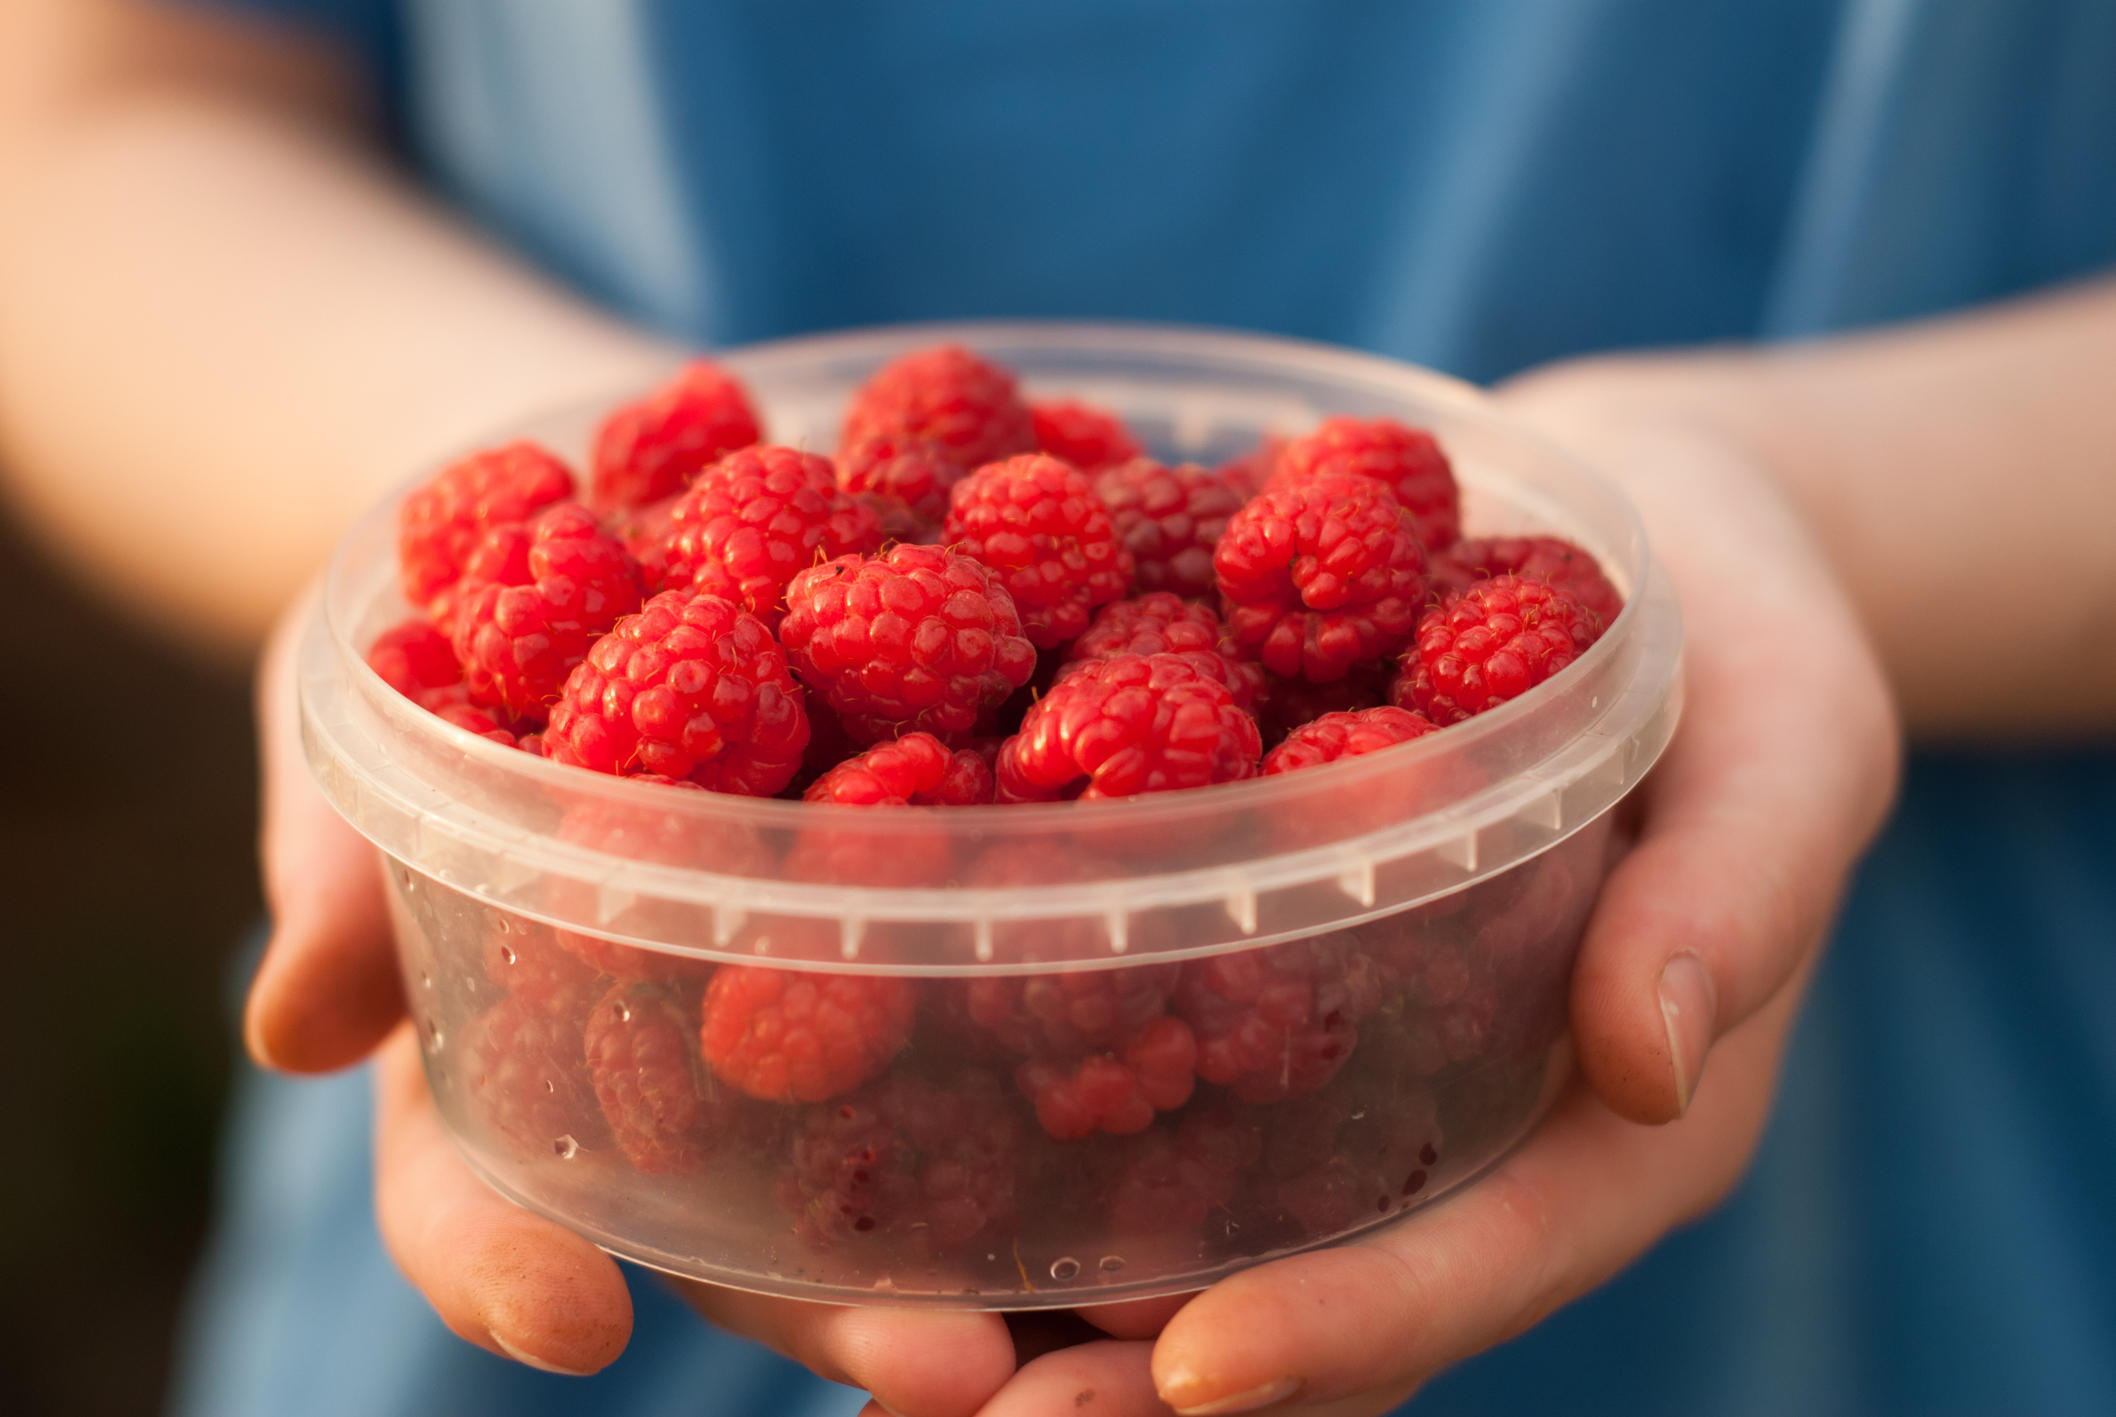 Child Holding Bowl of Fresh Raspberries Ready to Eat